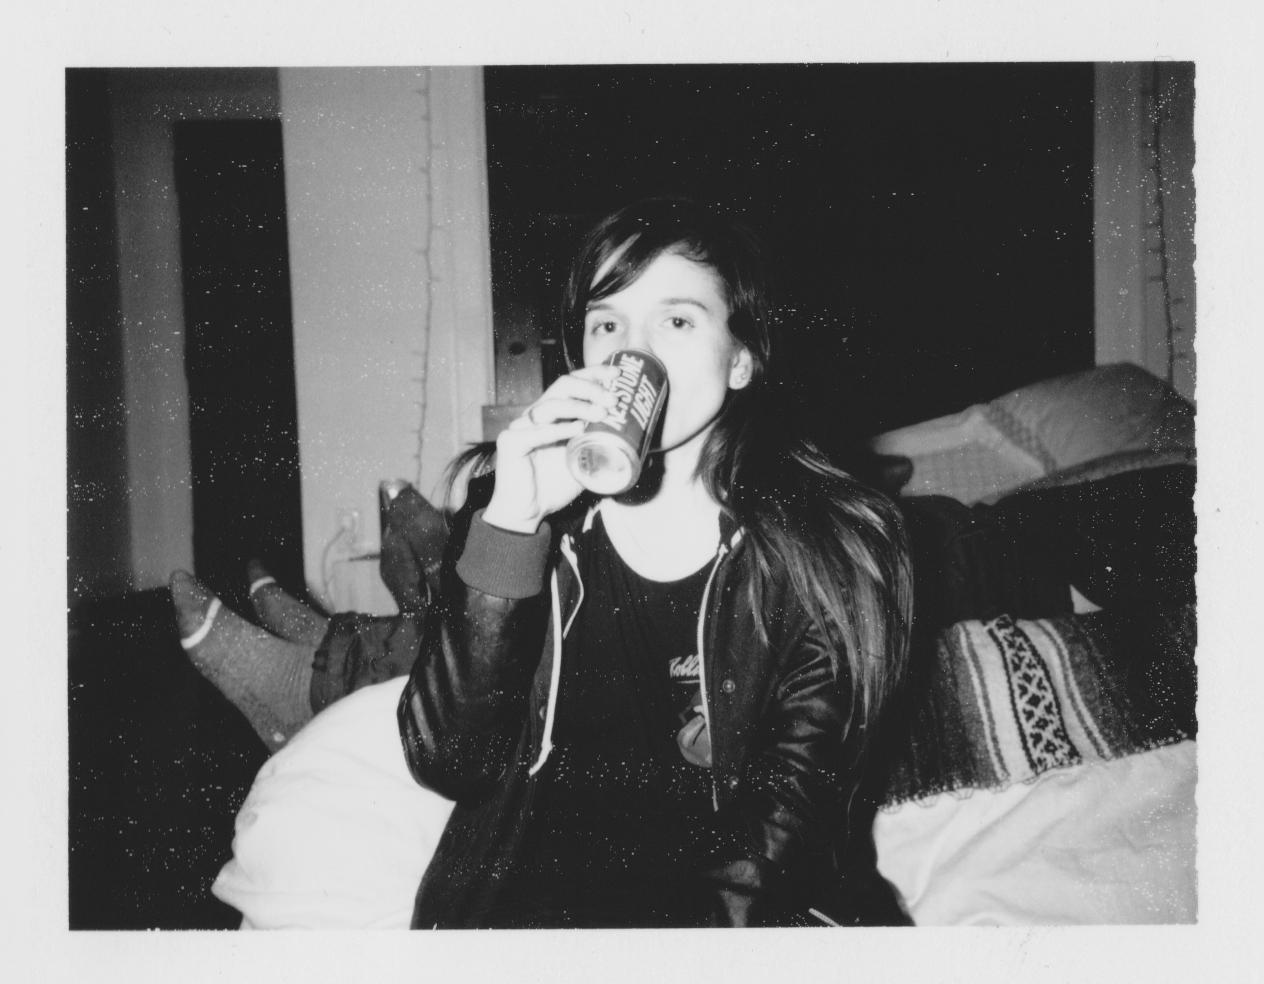 Kristin, Seattle | Winter 2012